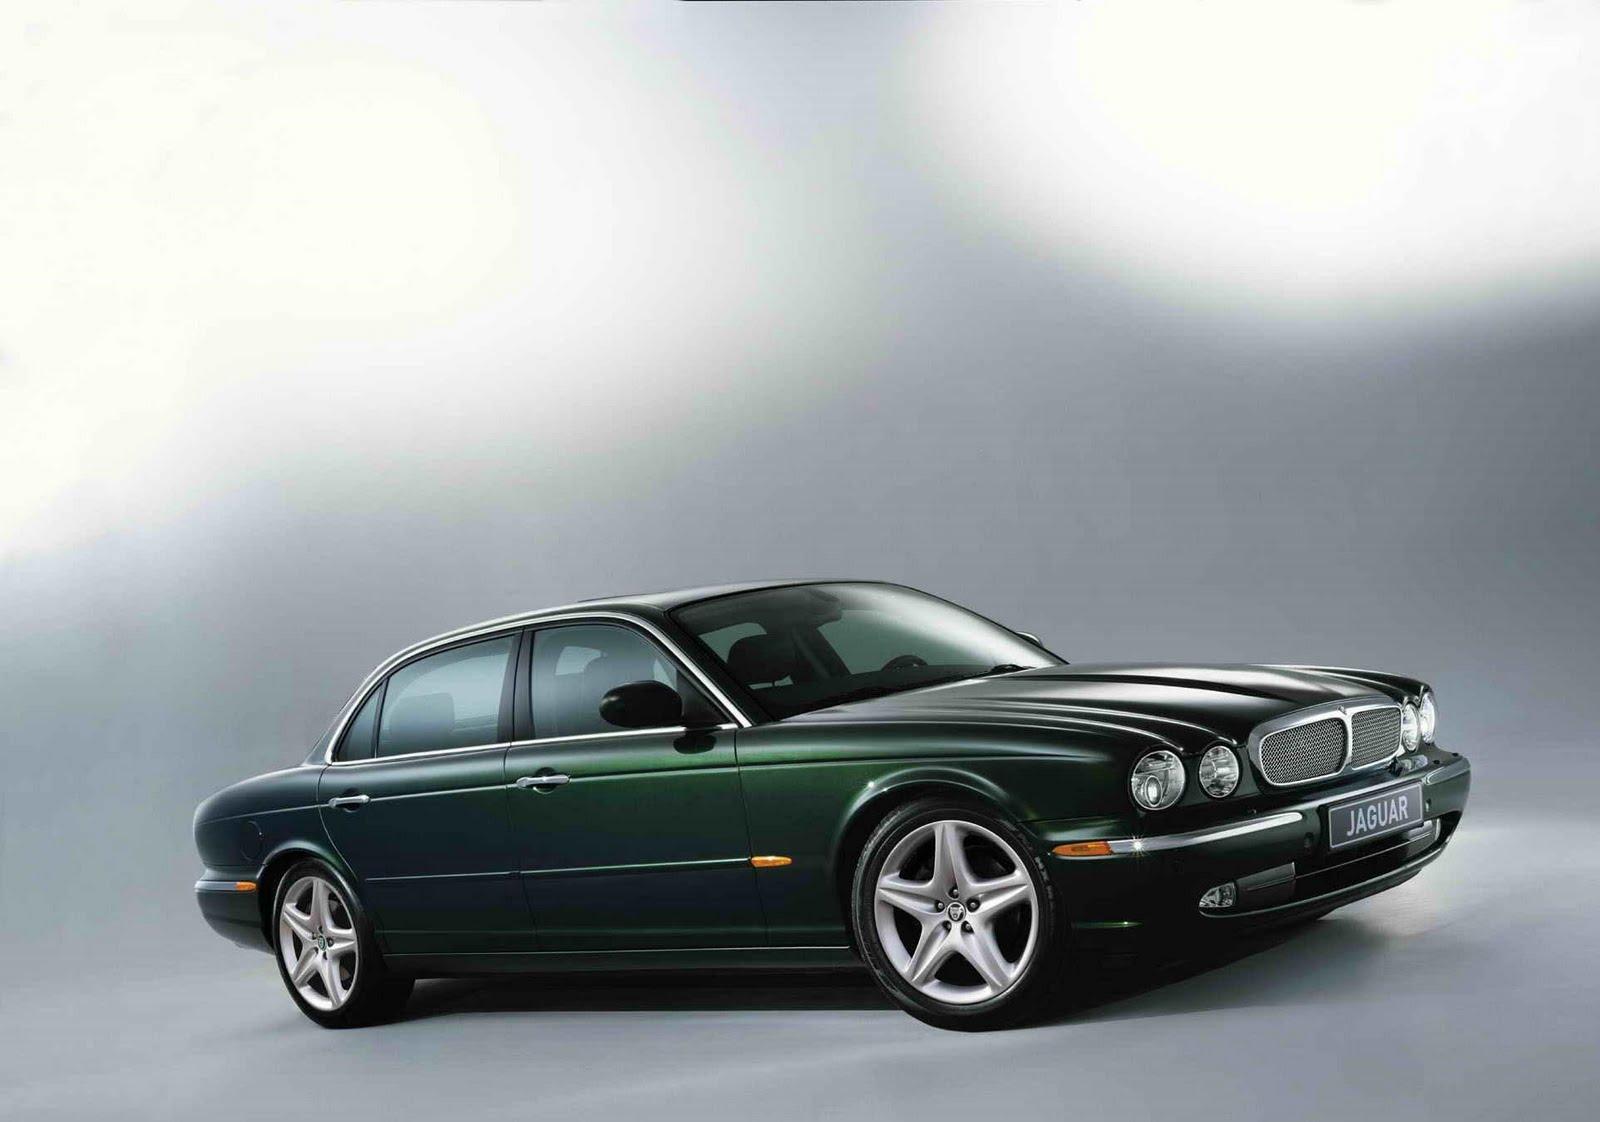 Car Jaguar Xj